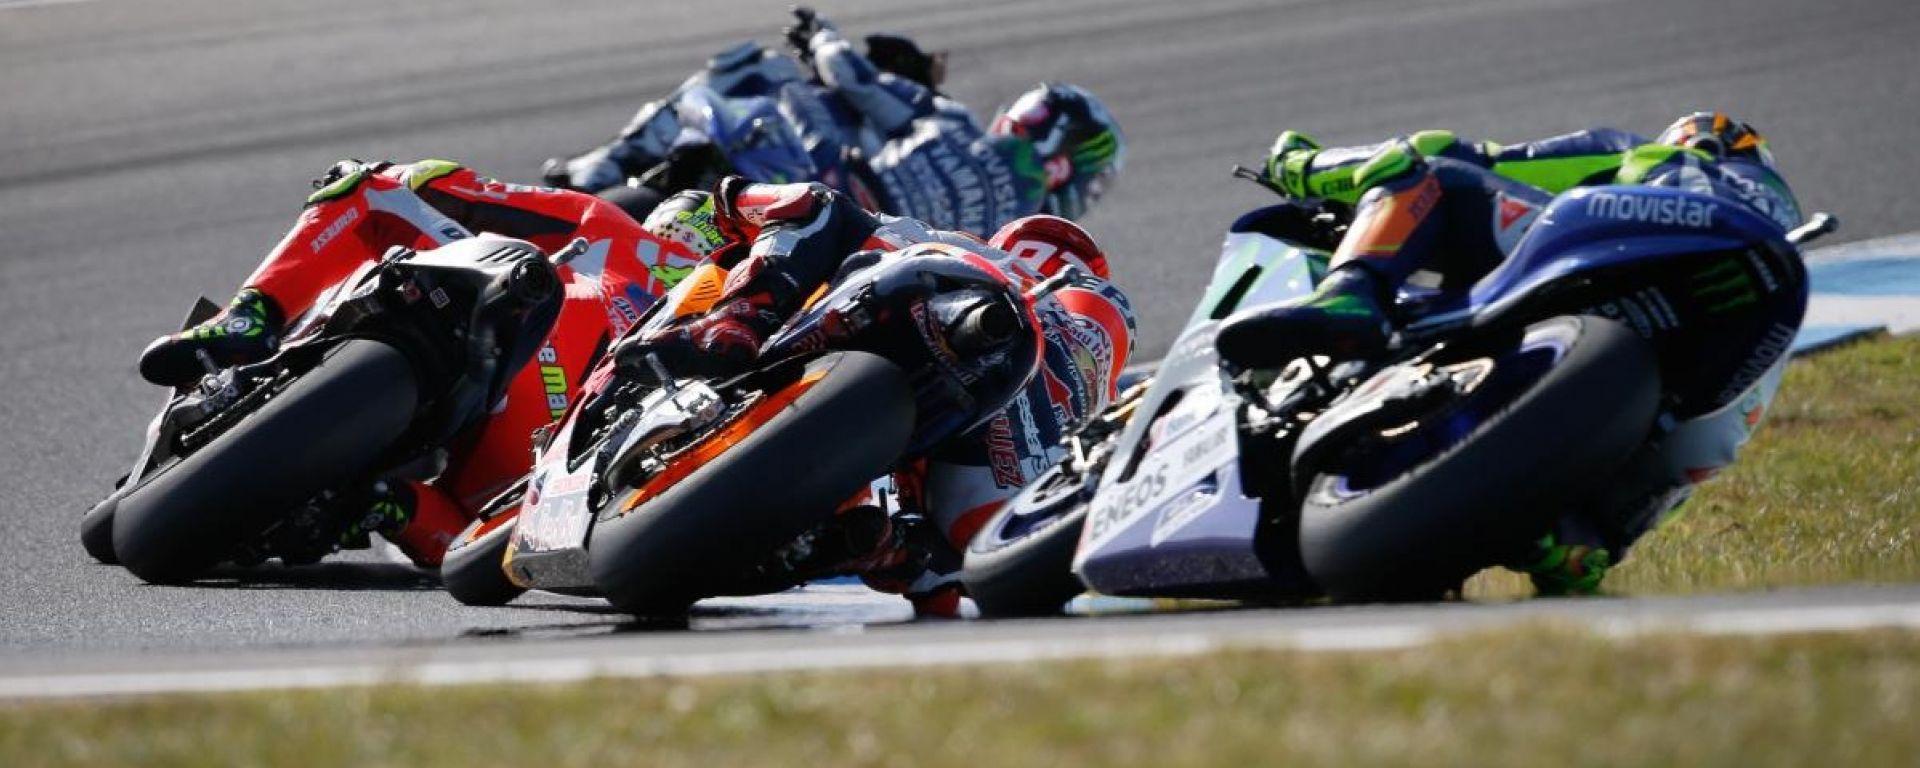 Test MotoGP Valencia 2017